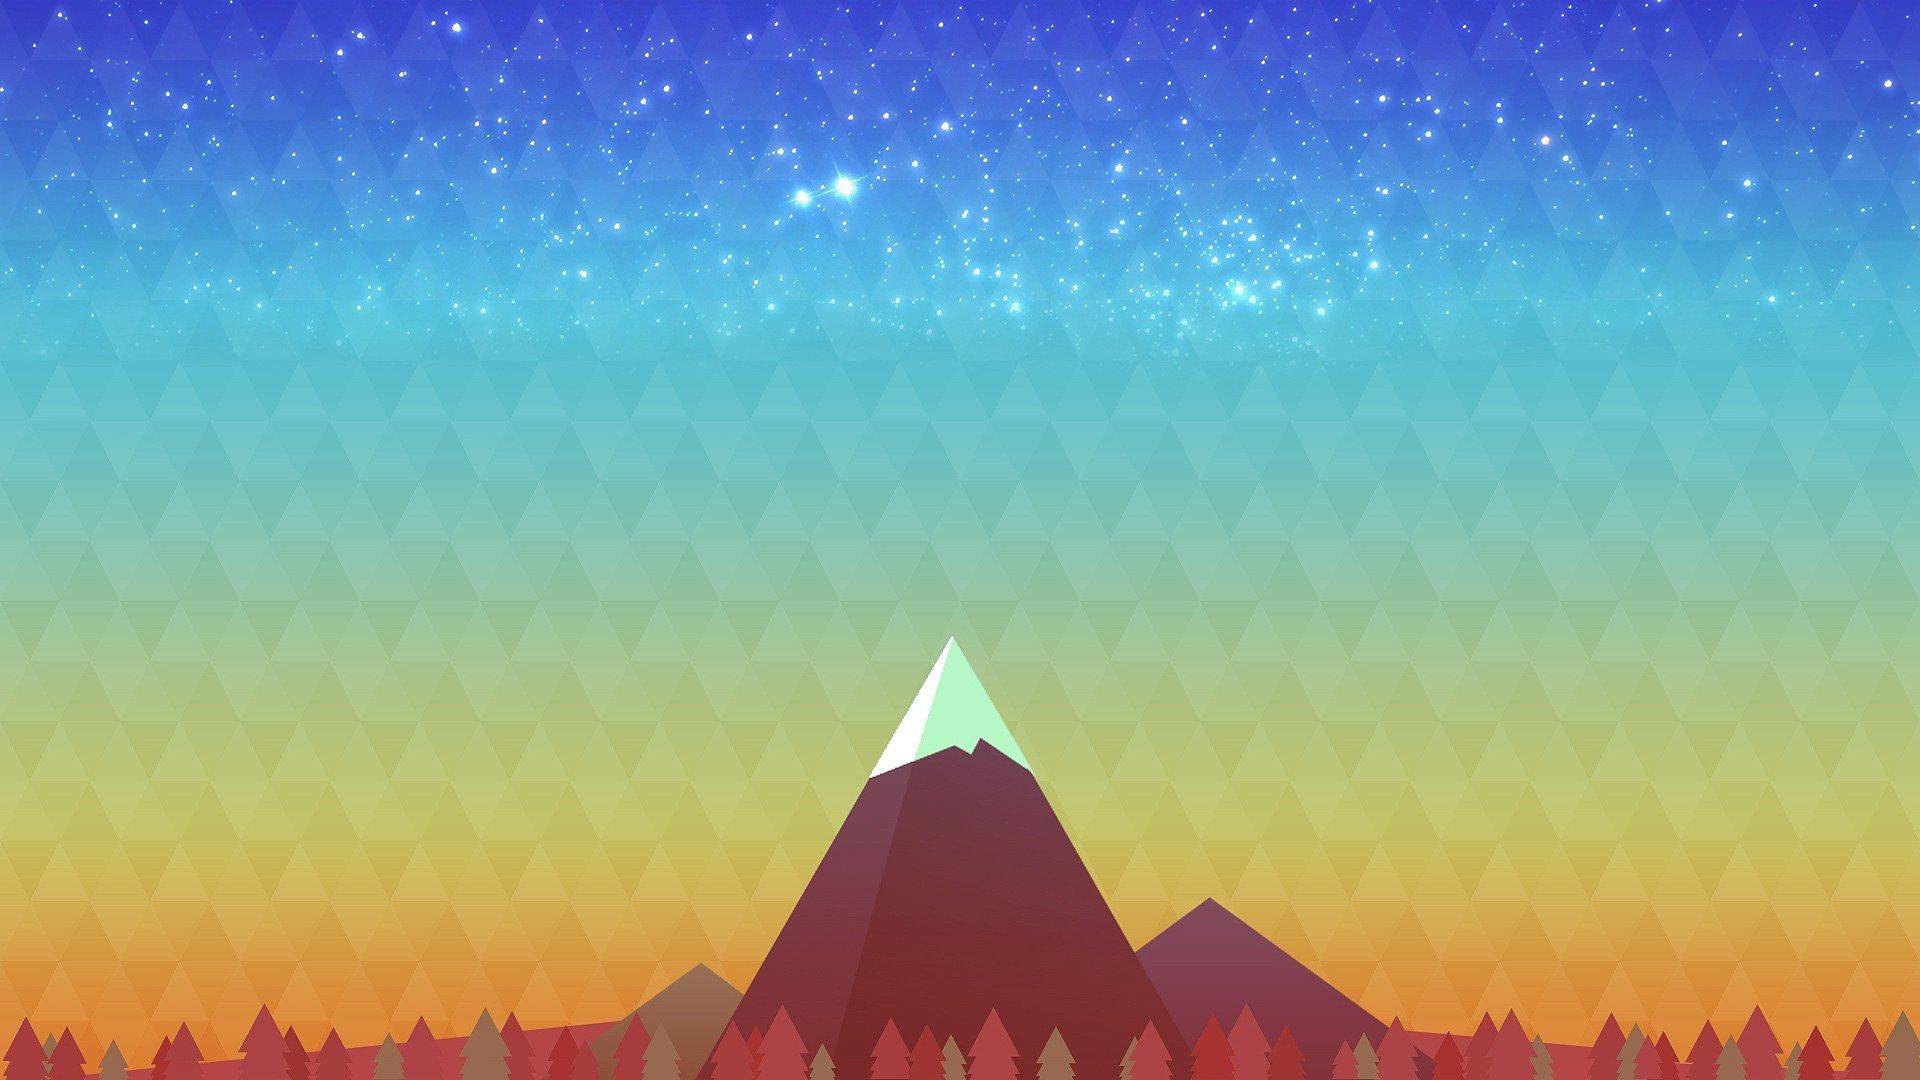 Pixel Forest Wallpaper Cute Minimalism Mountain Peak Hd Artist 4k Wallpapers Images